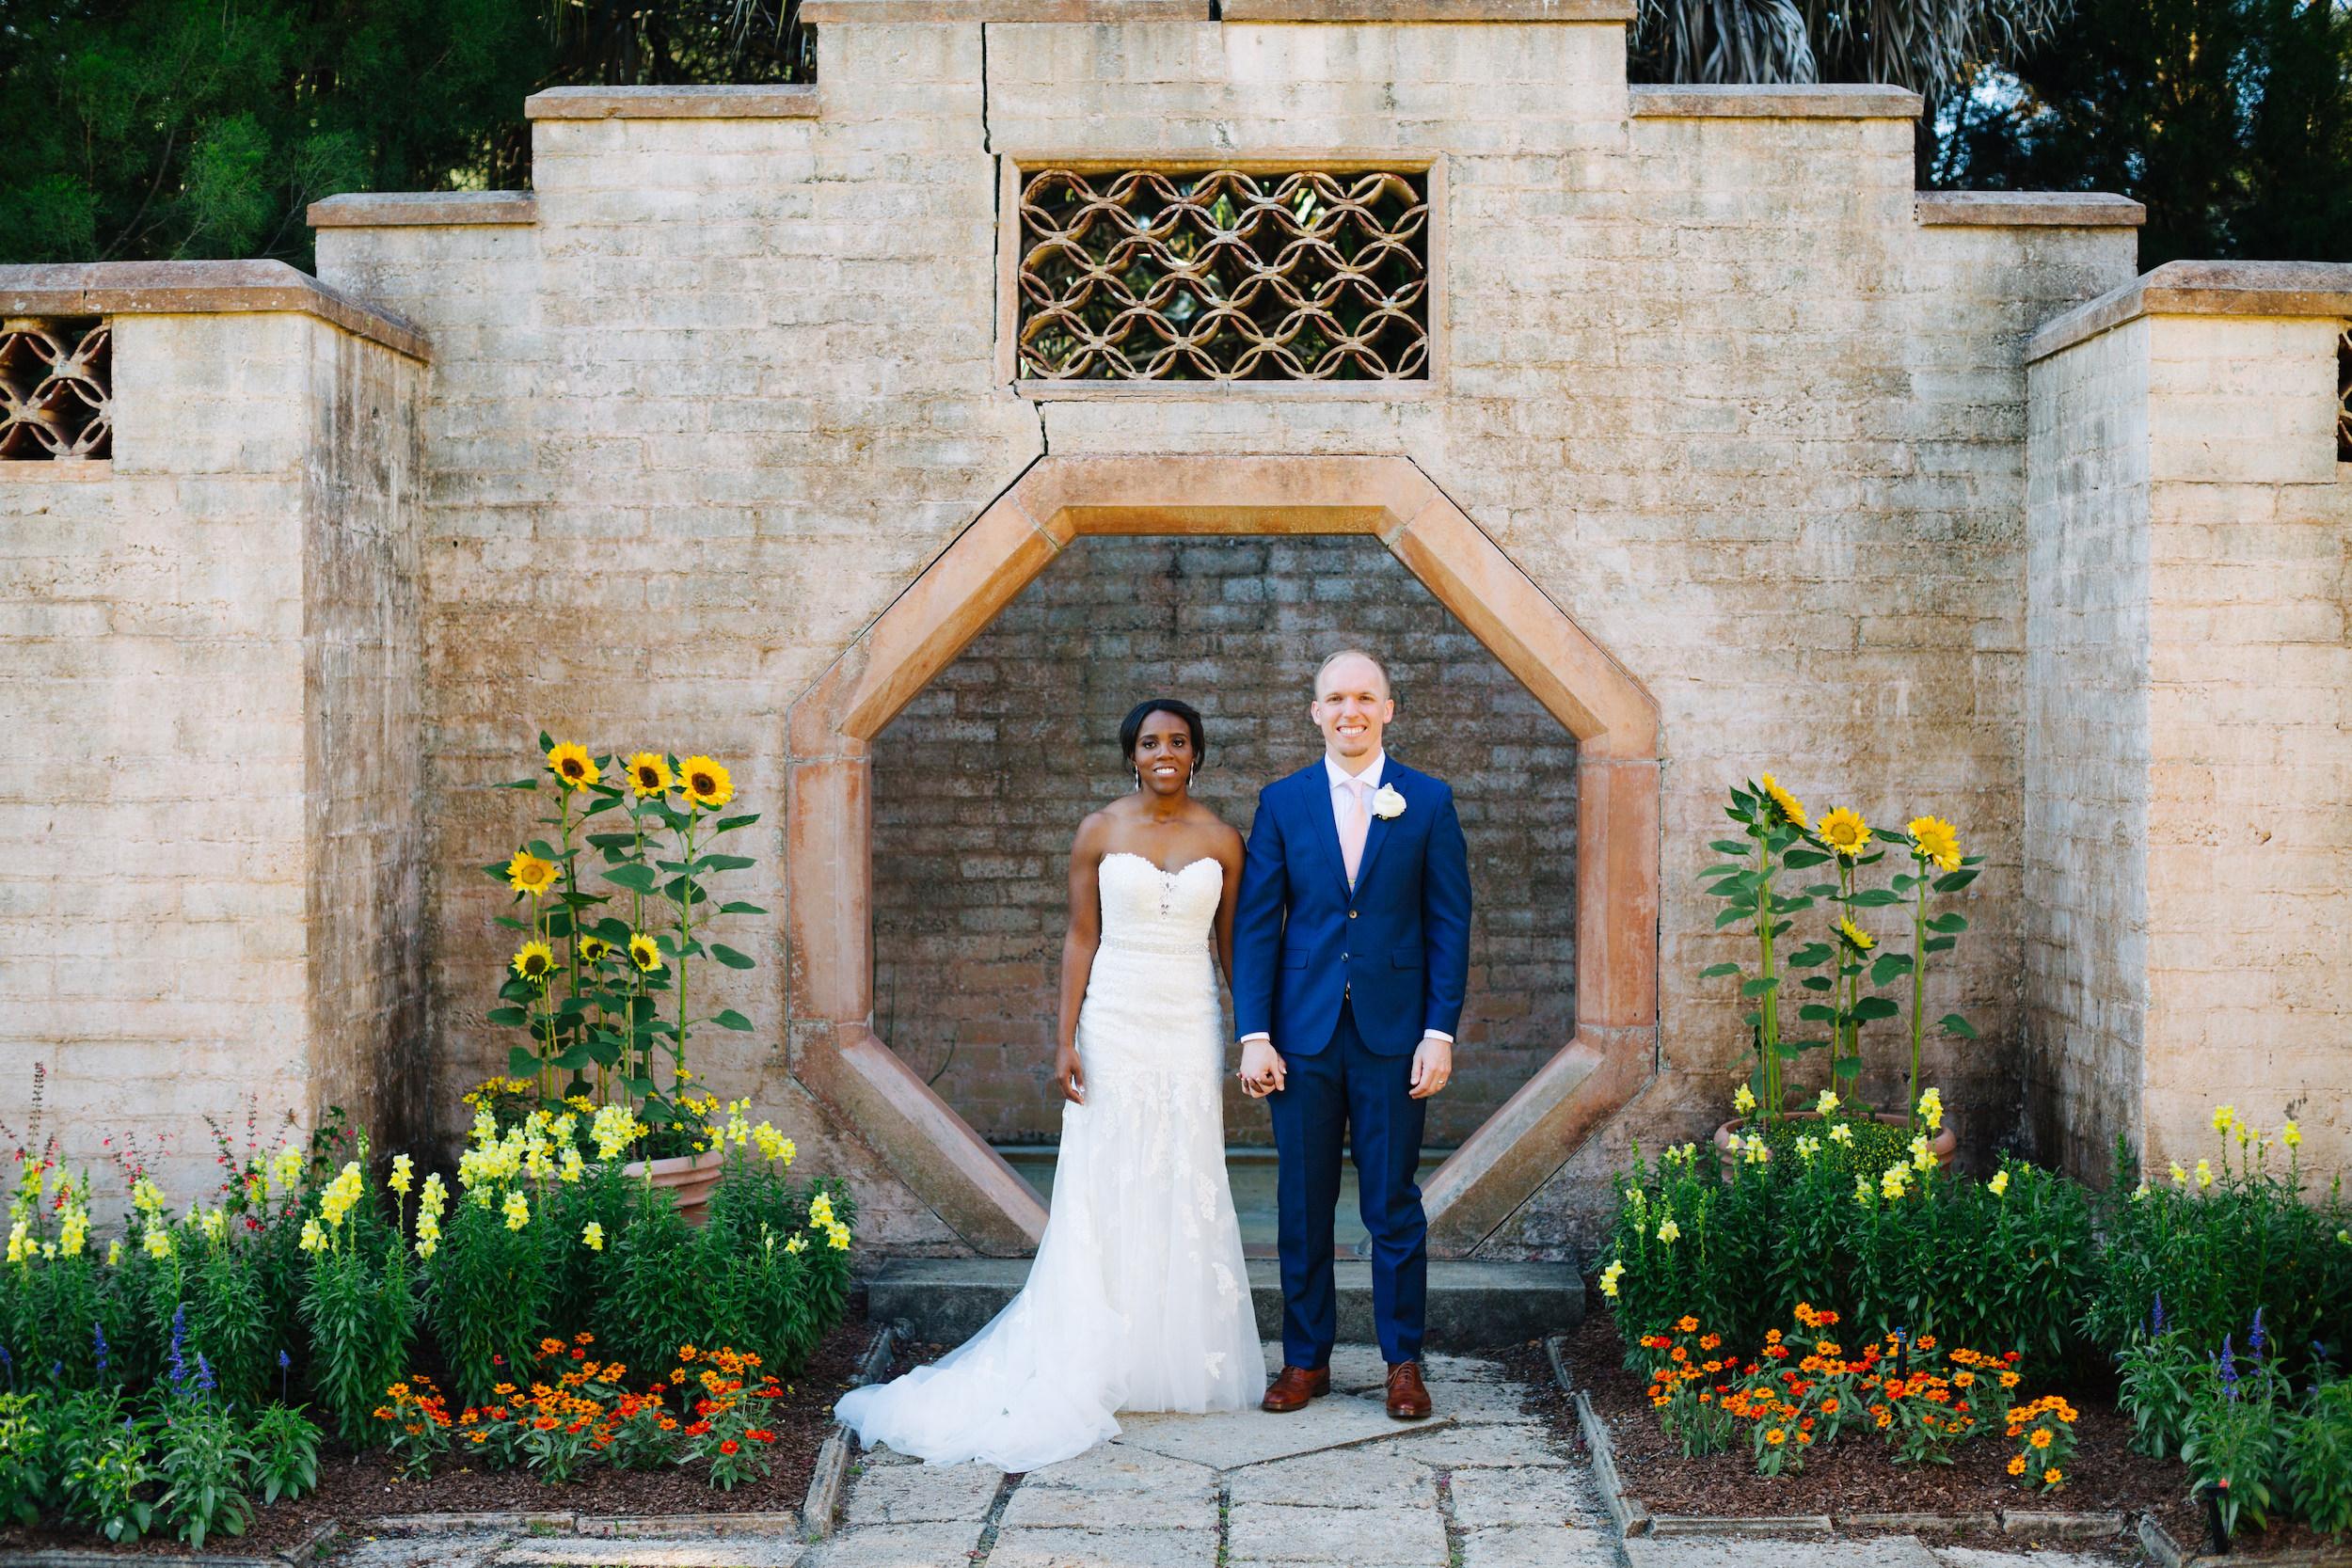 bok tower gardens wedding, bride and groom portraits at bok towerbok tower gardens wedding, bride and groom portraits at bok tower